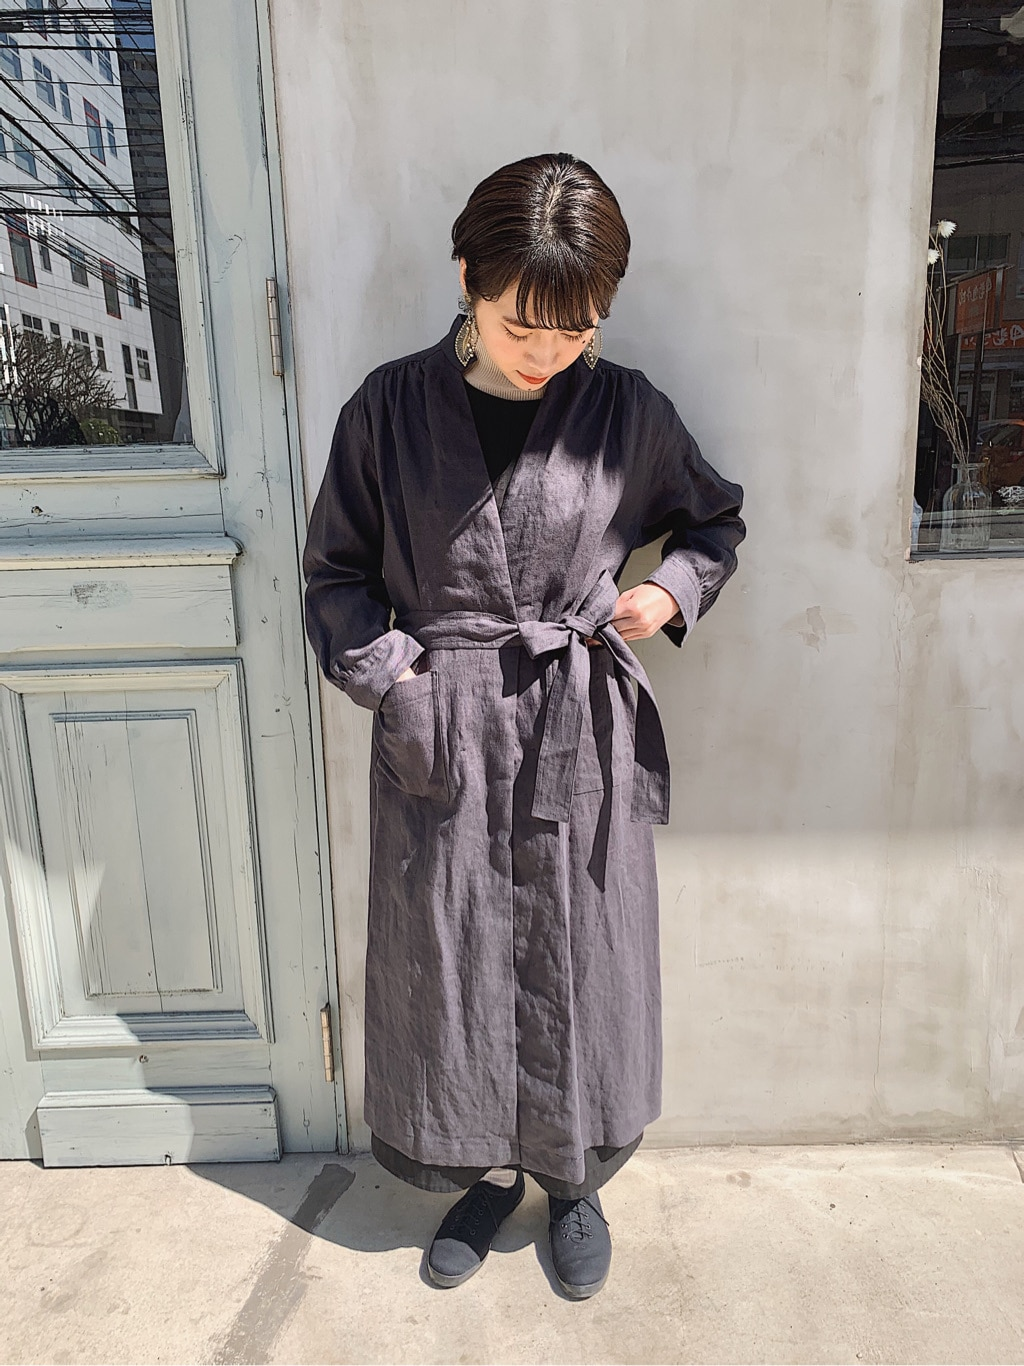 108 yuni / bulle de savon 福岡薬院路面 身長:158cm 2020.03.11